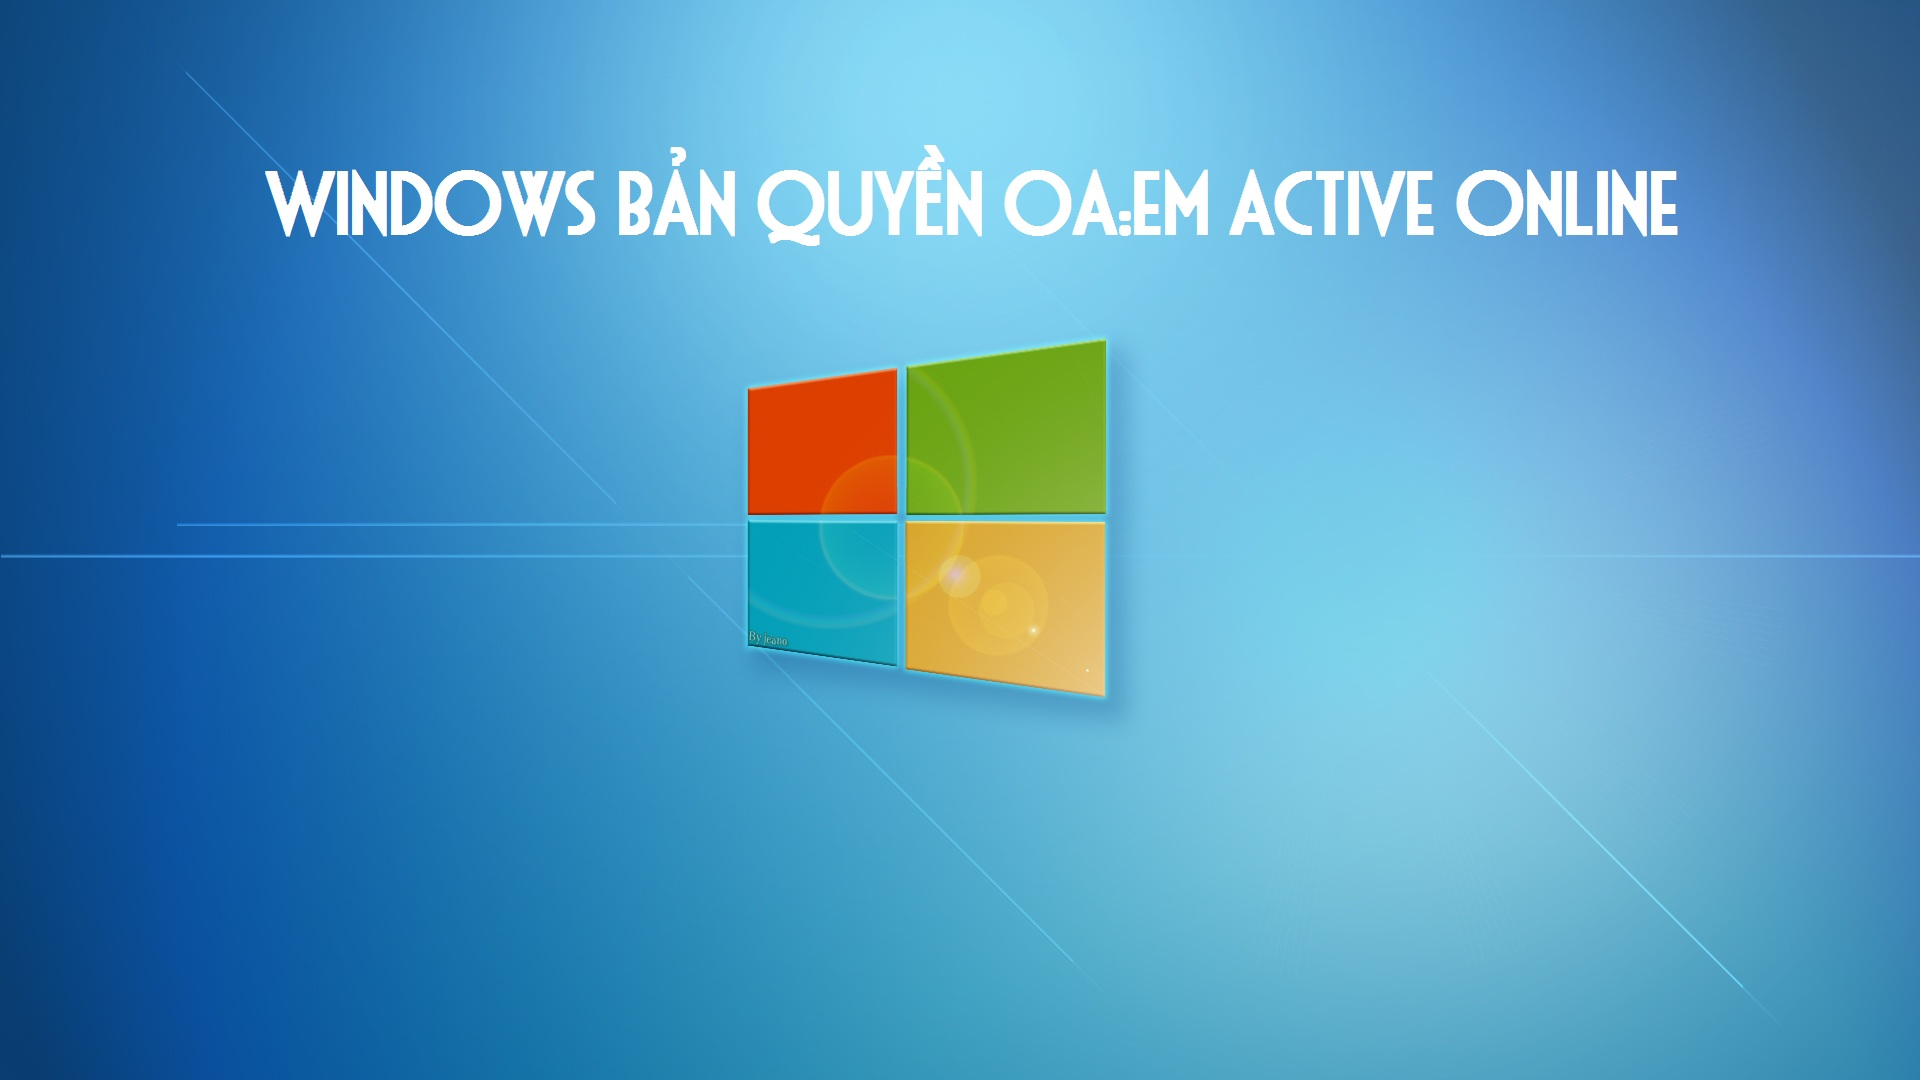 [Tổng hợp] Link tải Windows Bản Quyền OA:EM Active Online